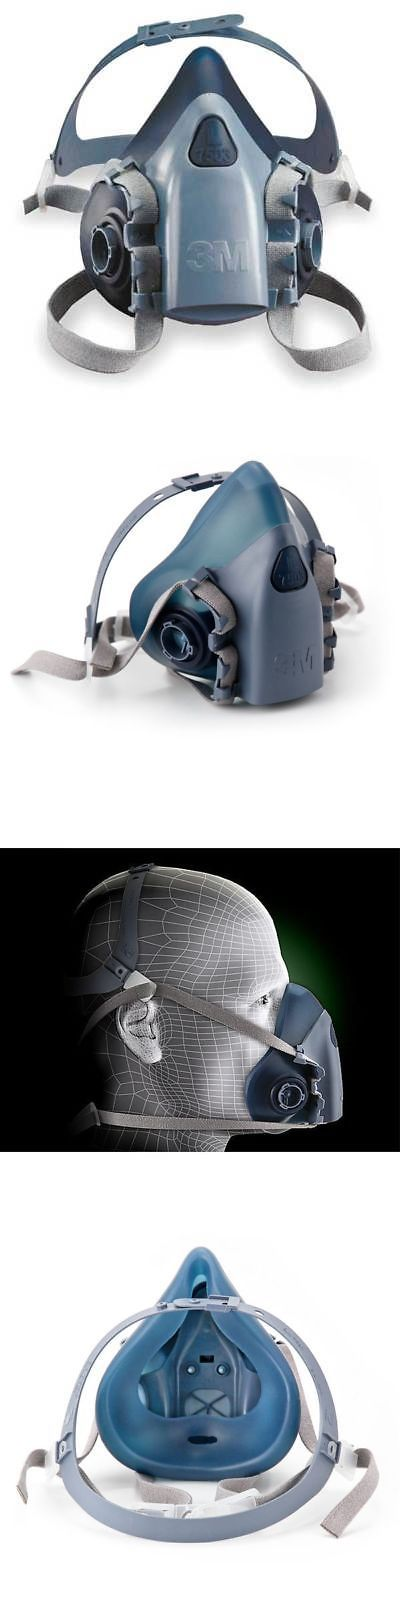 3m 7503 series half mask respirator